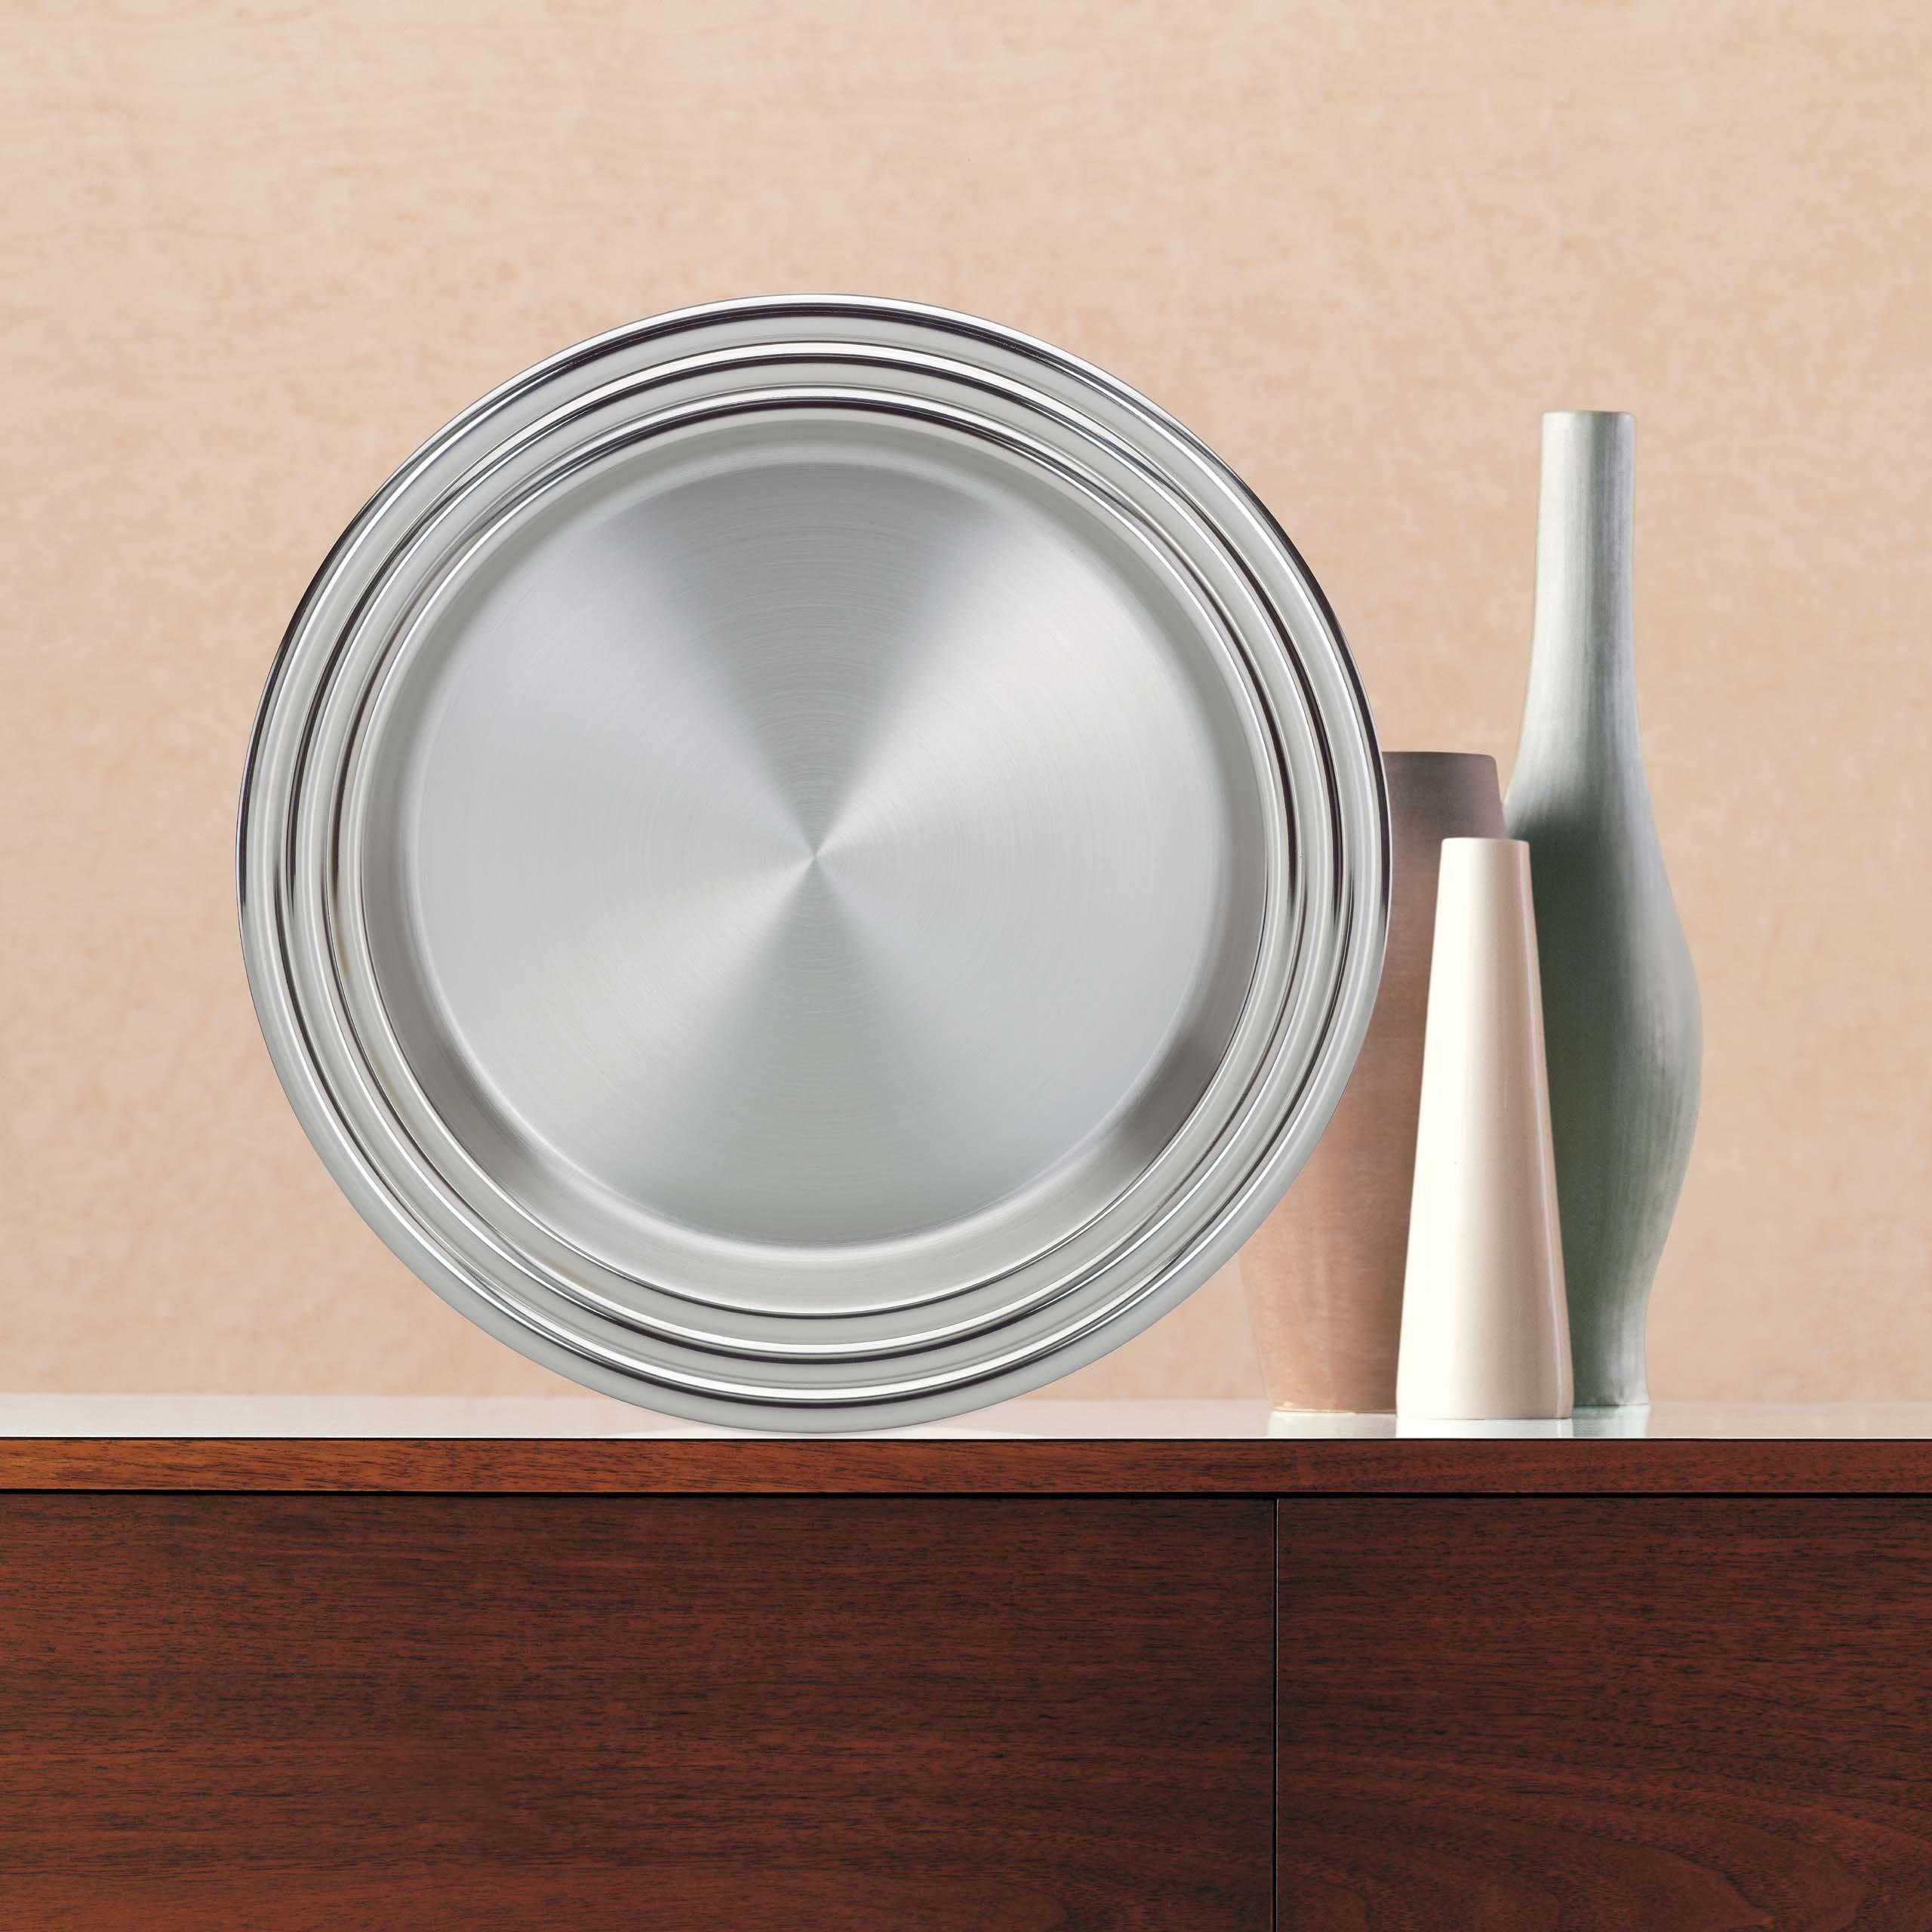 Lenox Tuscany Classics Stainless-Steel Tray